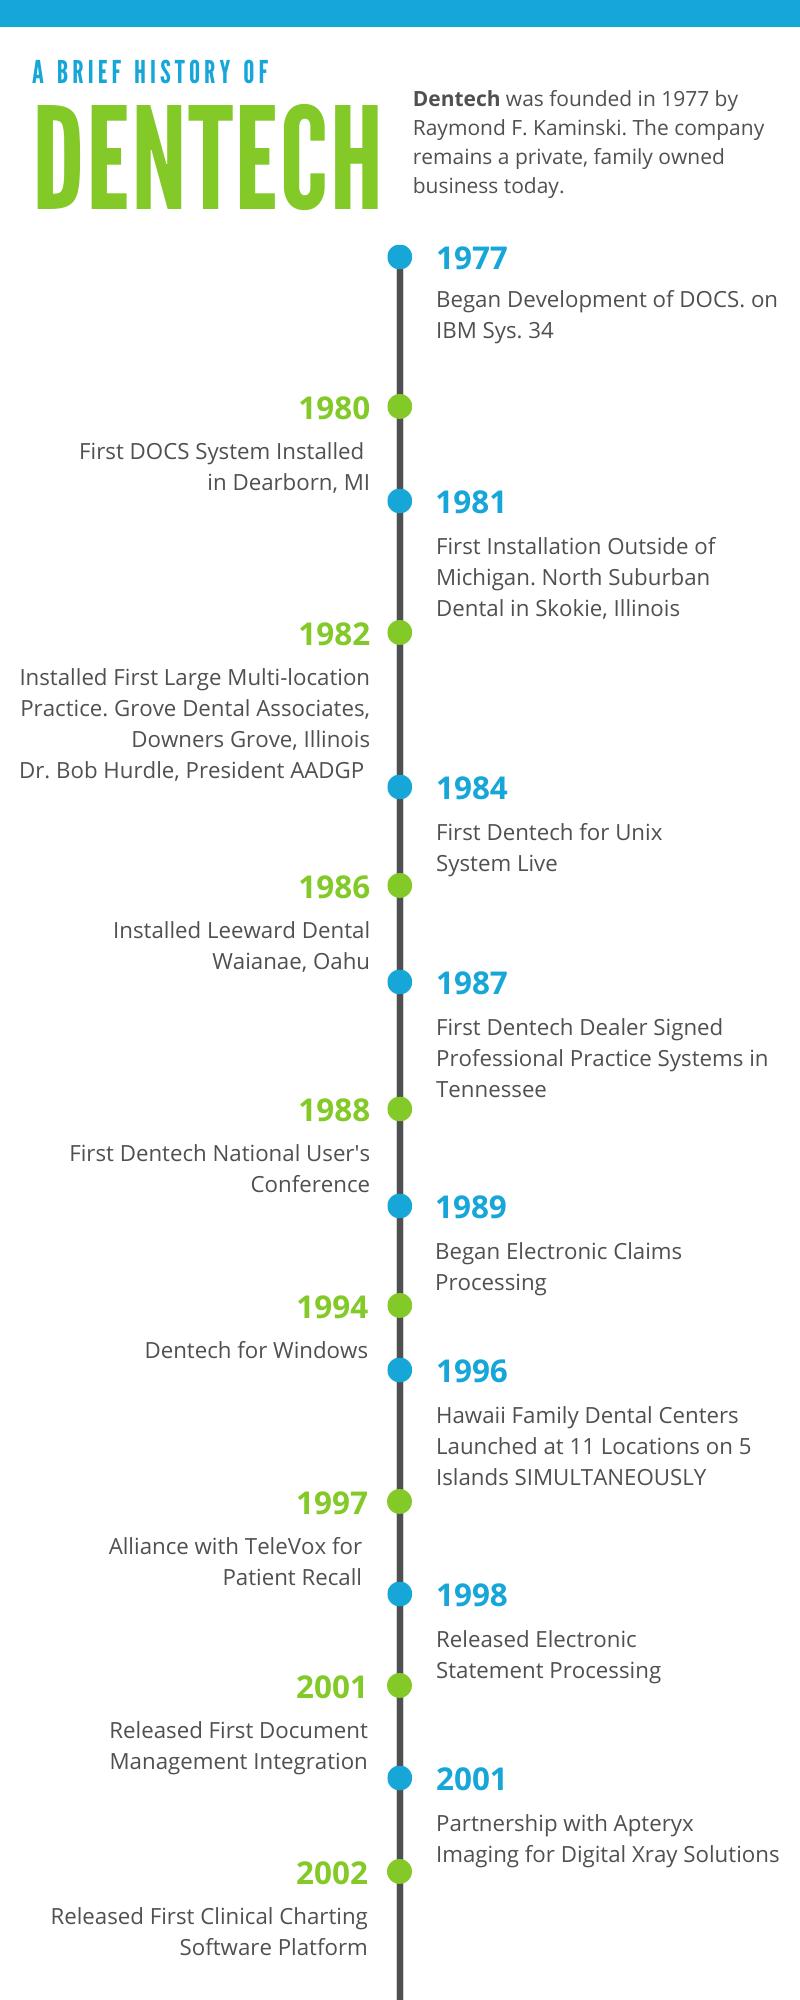 About Dentech Timeline 1977-2002